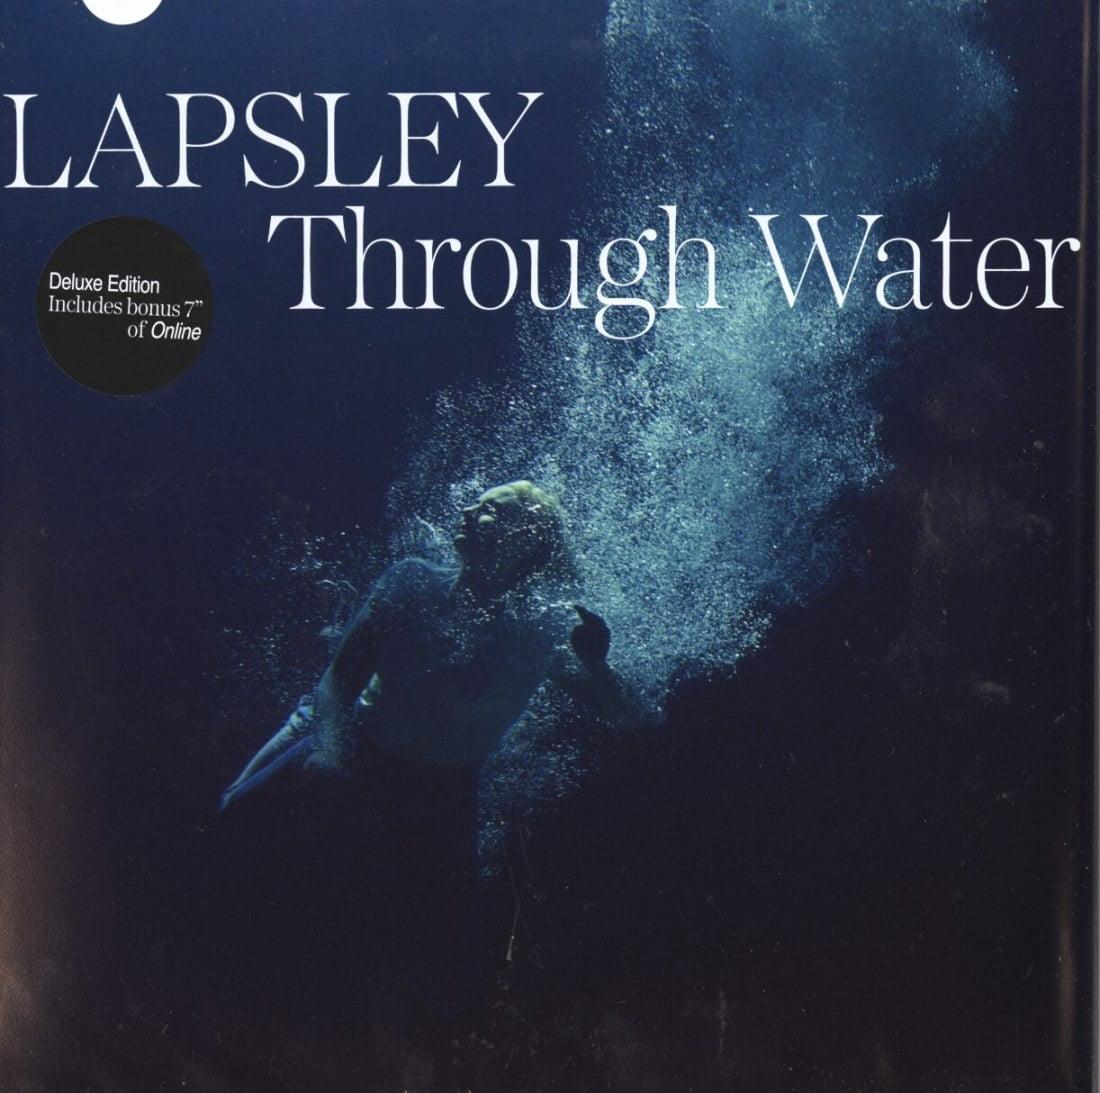 "Lapsley - Through Water - Deluxe Edition, Vinyl, LP, Poster, Bonus 7"", XL Recordings, 2020"